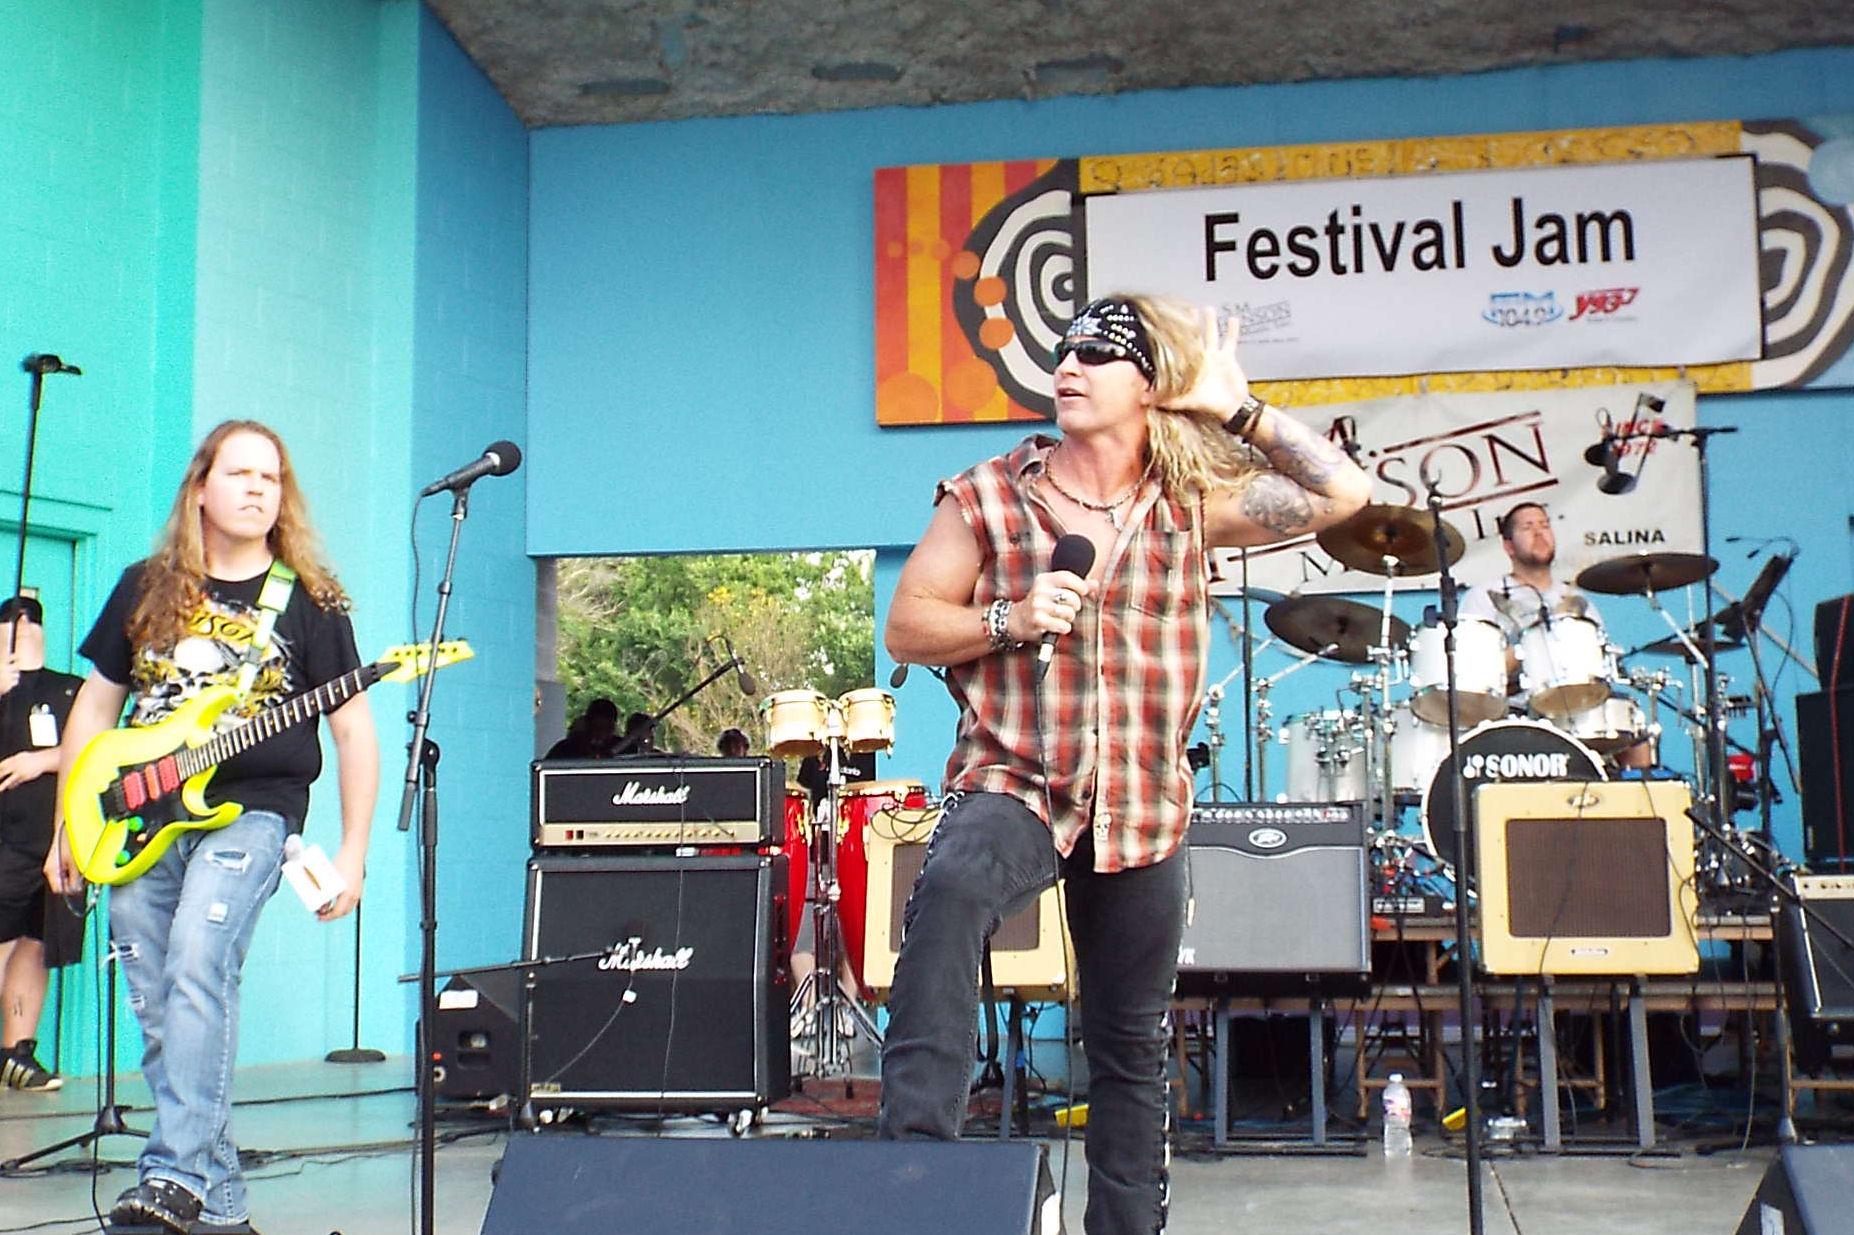 PHOTO GALLERY: 30th Festival Jam Rocks